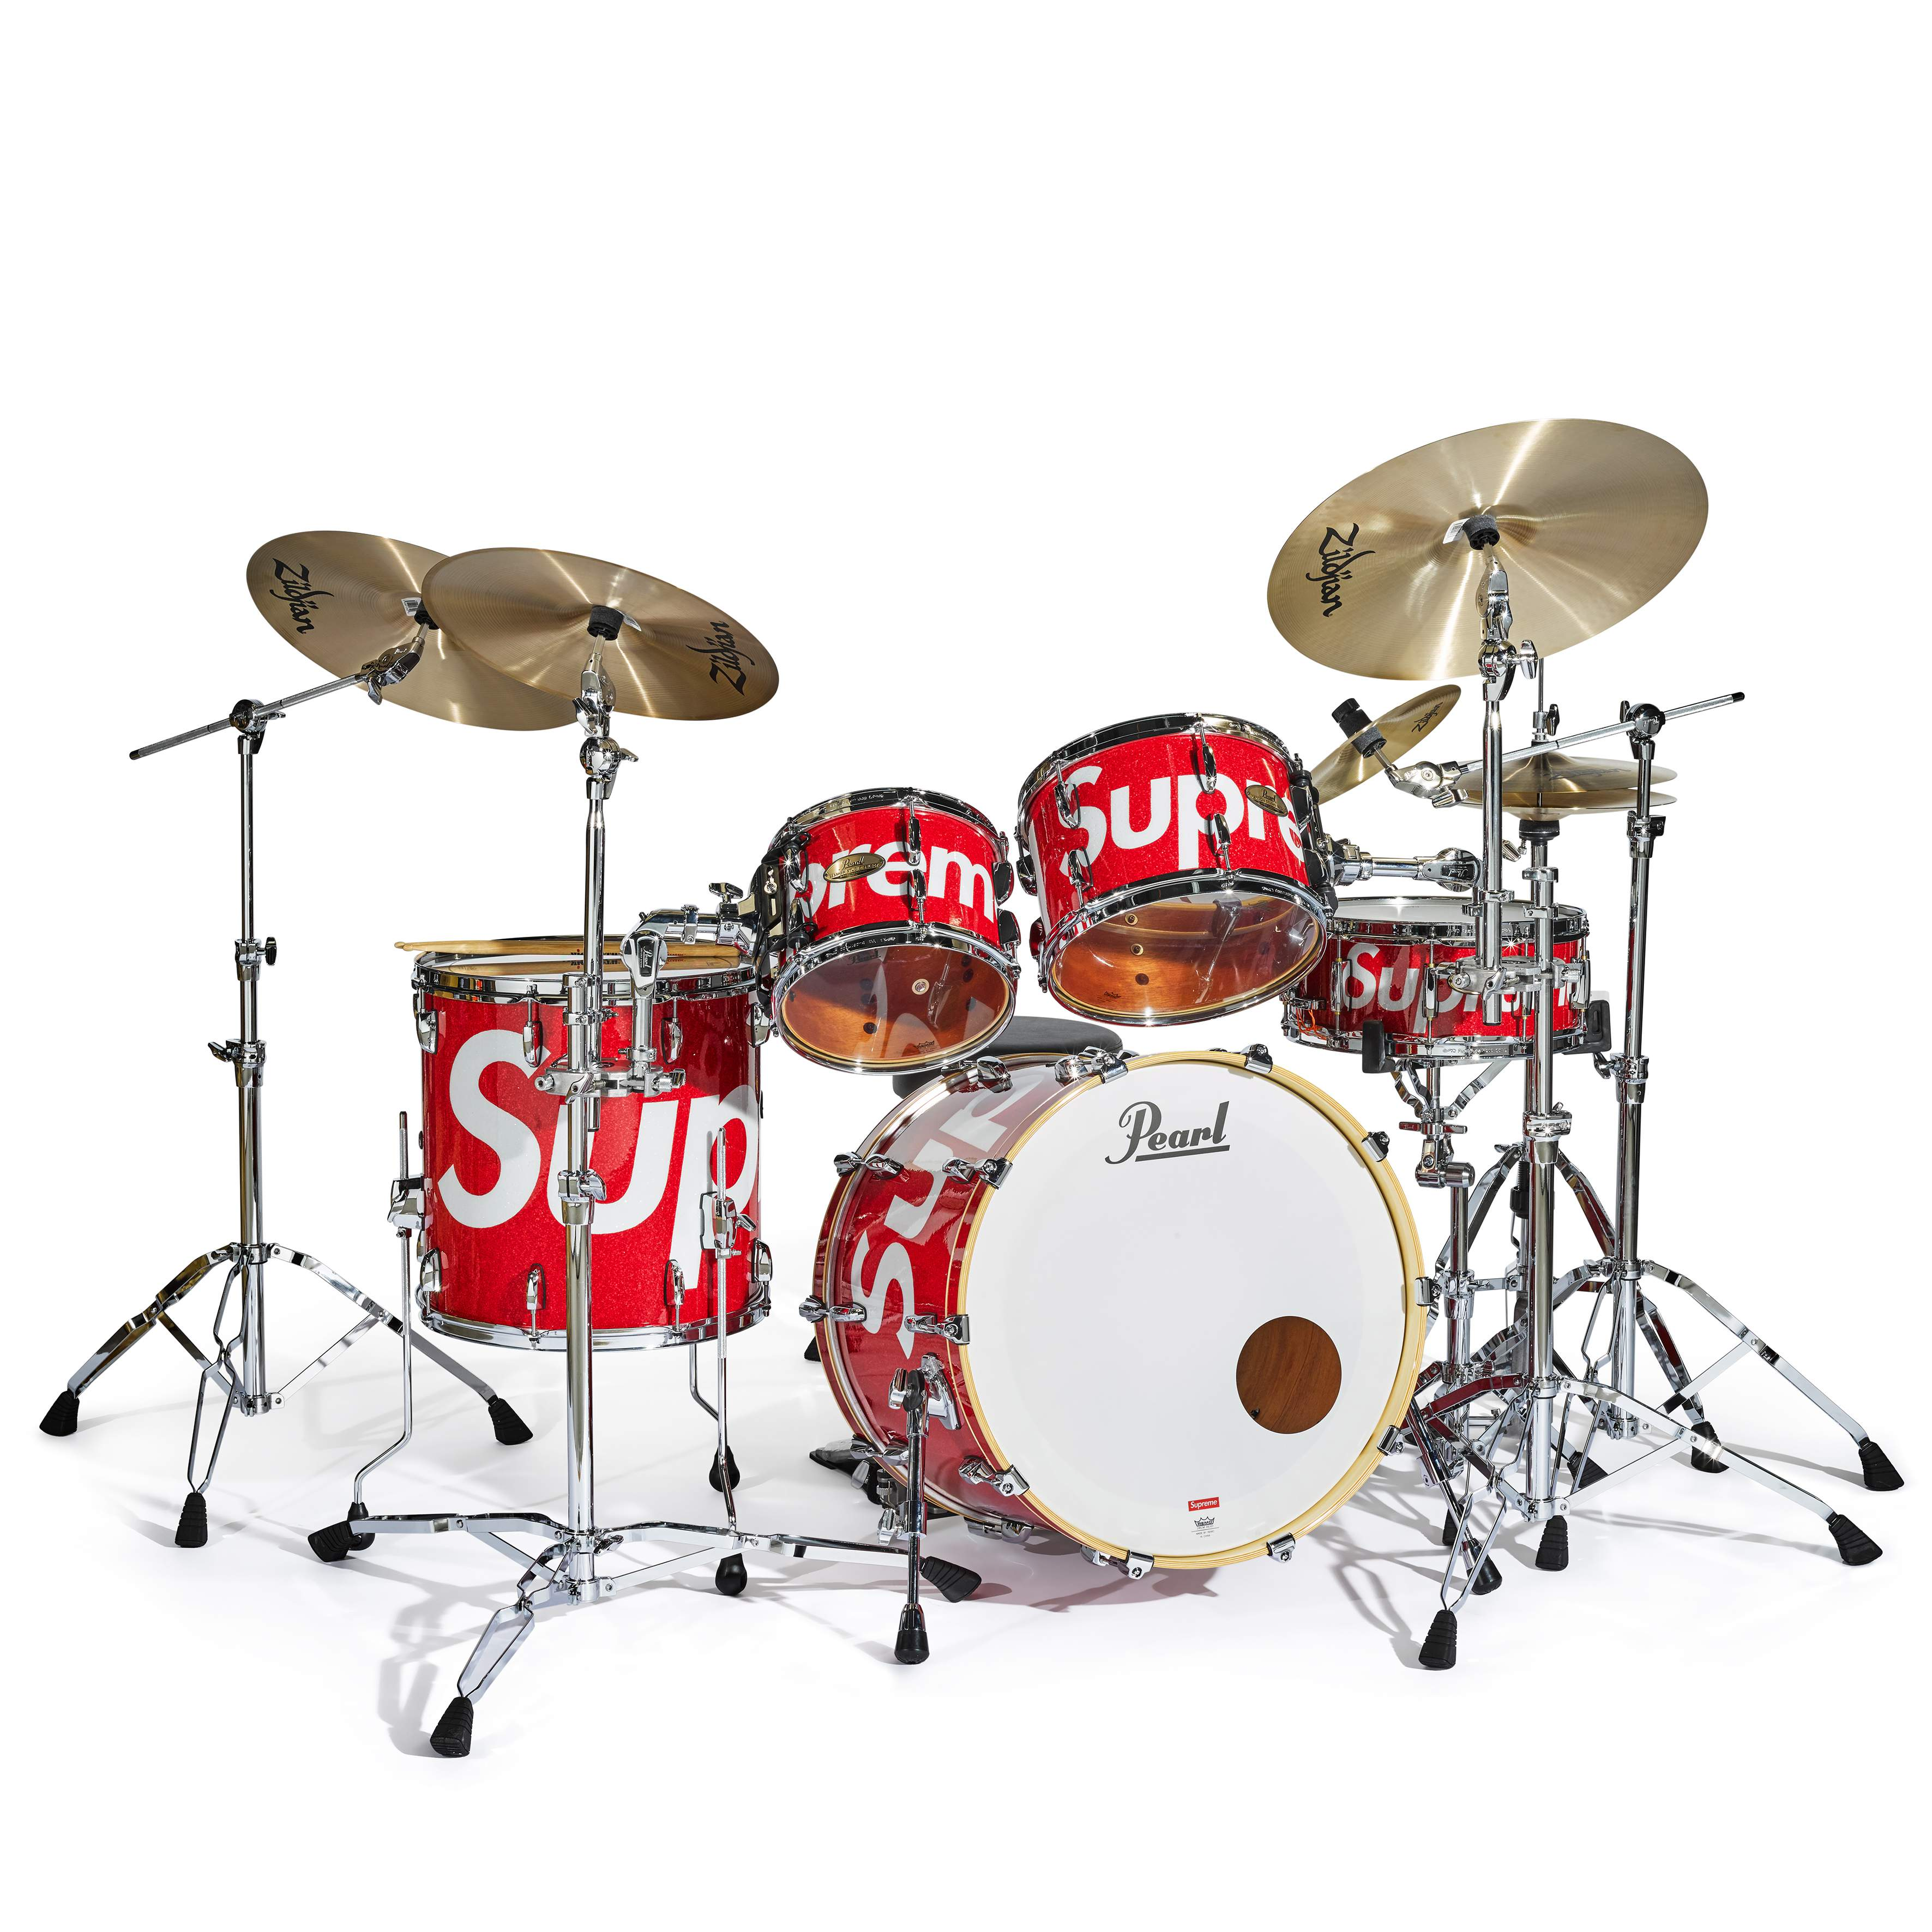 View full screen - View 1 of Lot 27. Session Studio Select Drum Set & Zildjian® Cymbals, 2019.